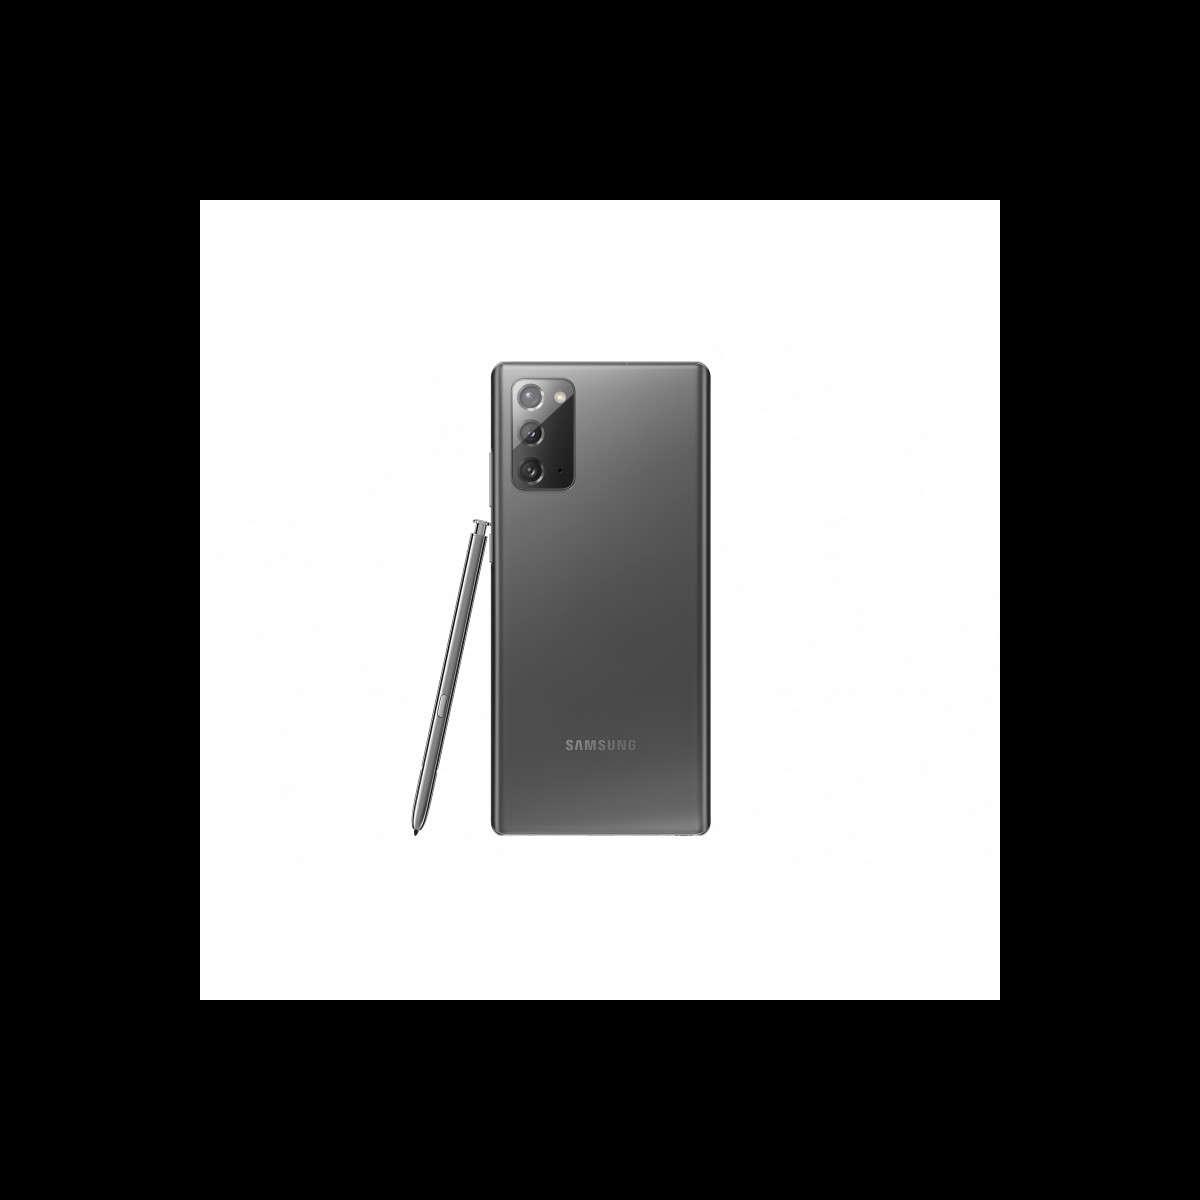 Galaxy Note 20 5G - 256Go - Entreprise Edition - Gris